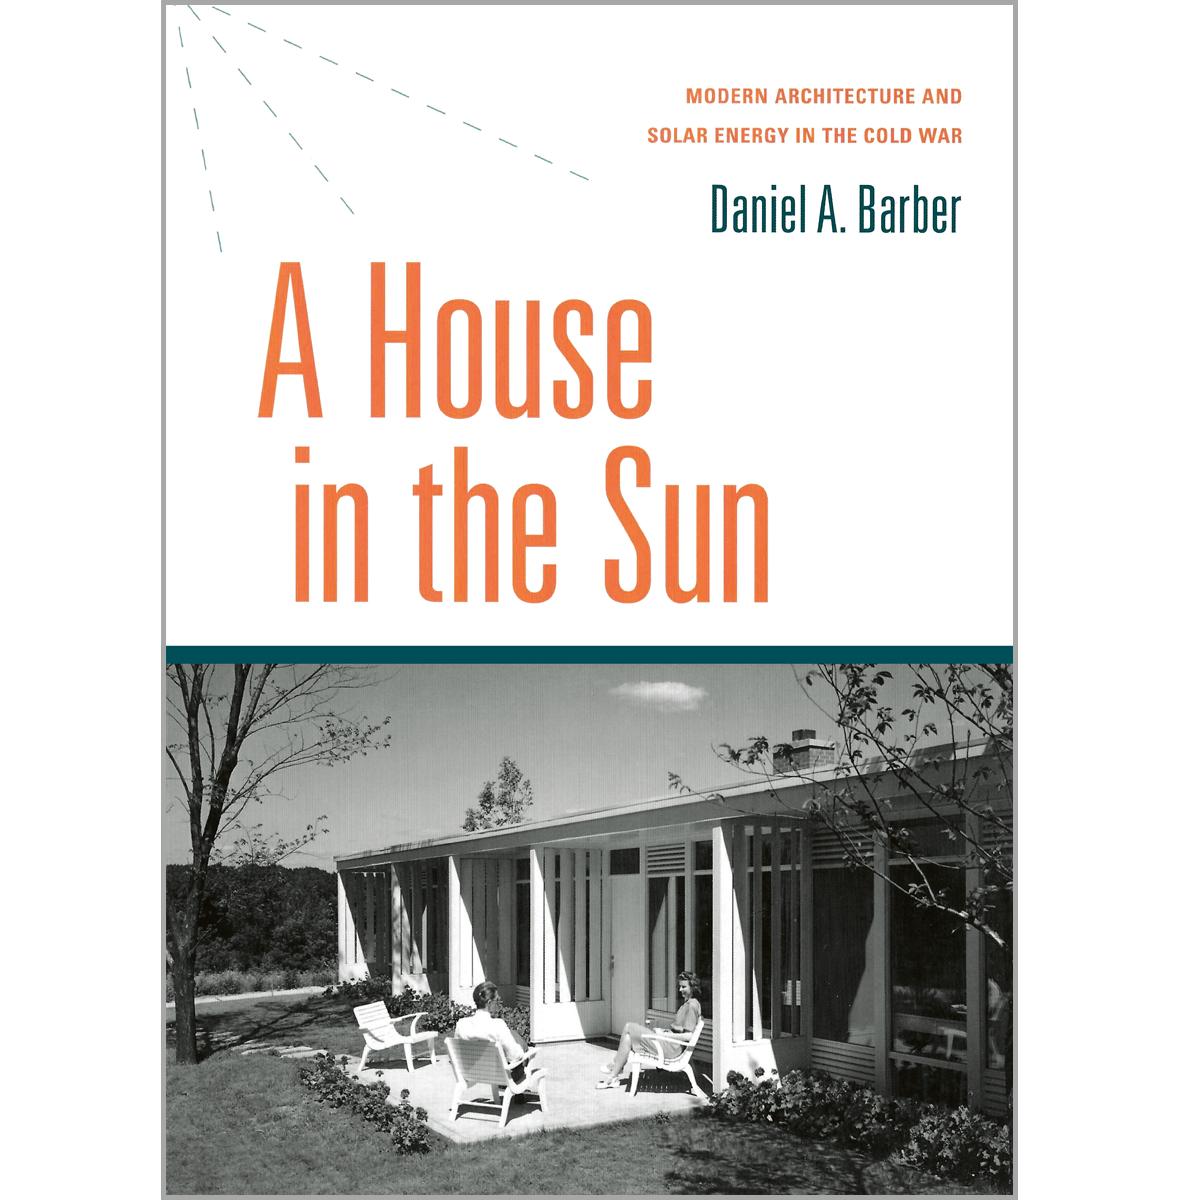 A House in the Sun